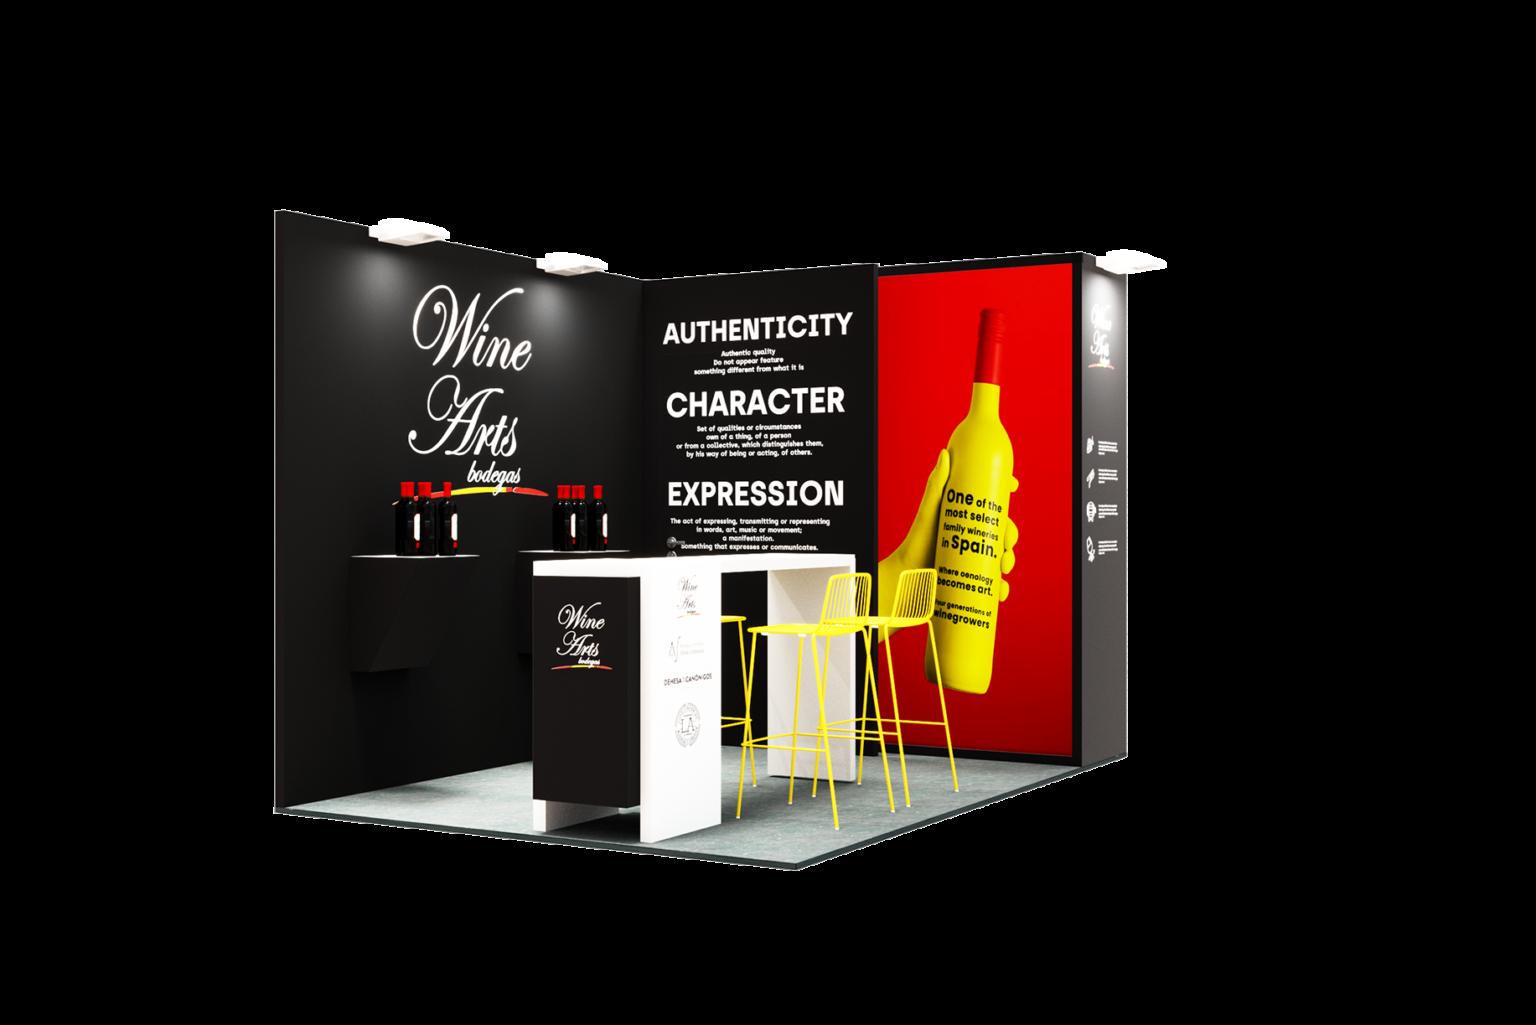 propuesta-diseño-de-stands-STAND-WINE-ARTS--PROWEIN-DUSSELDORF-2020-MATERIA-EFIMERA